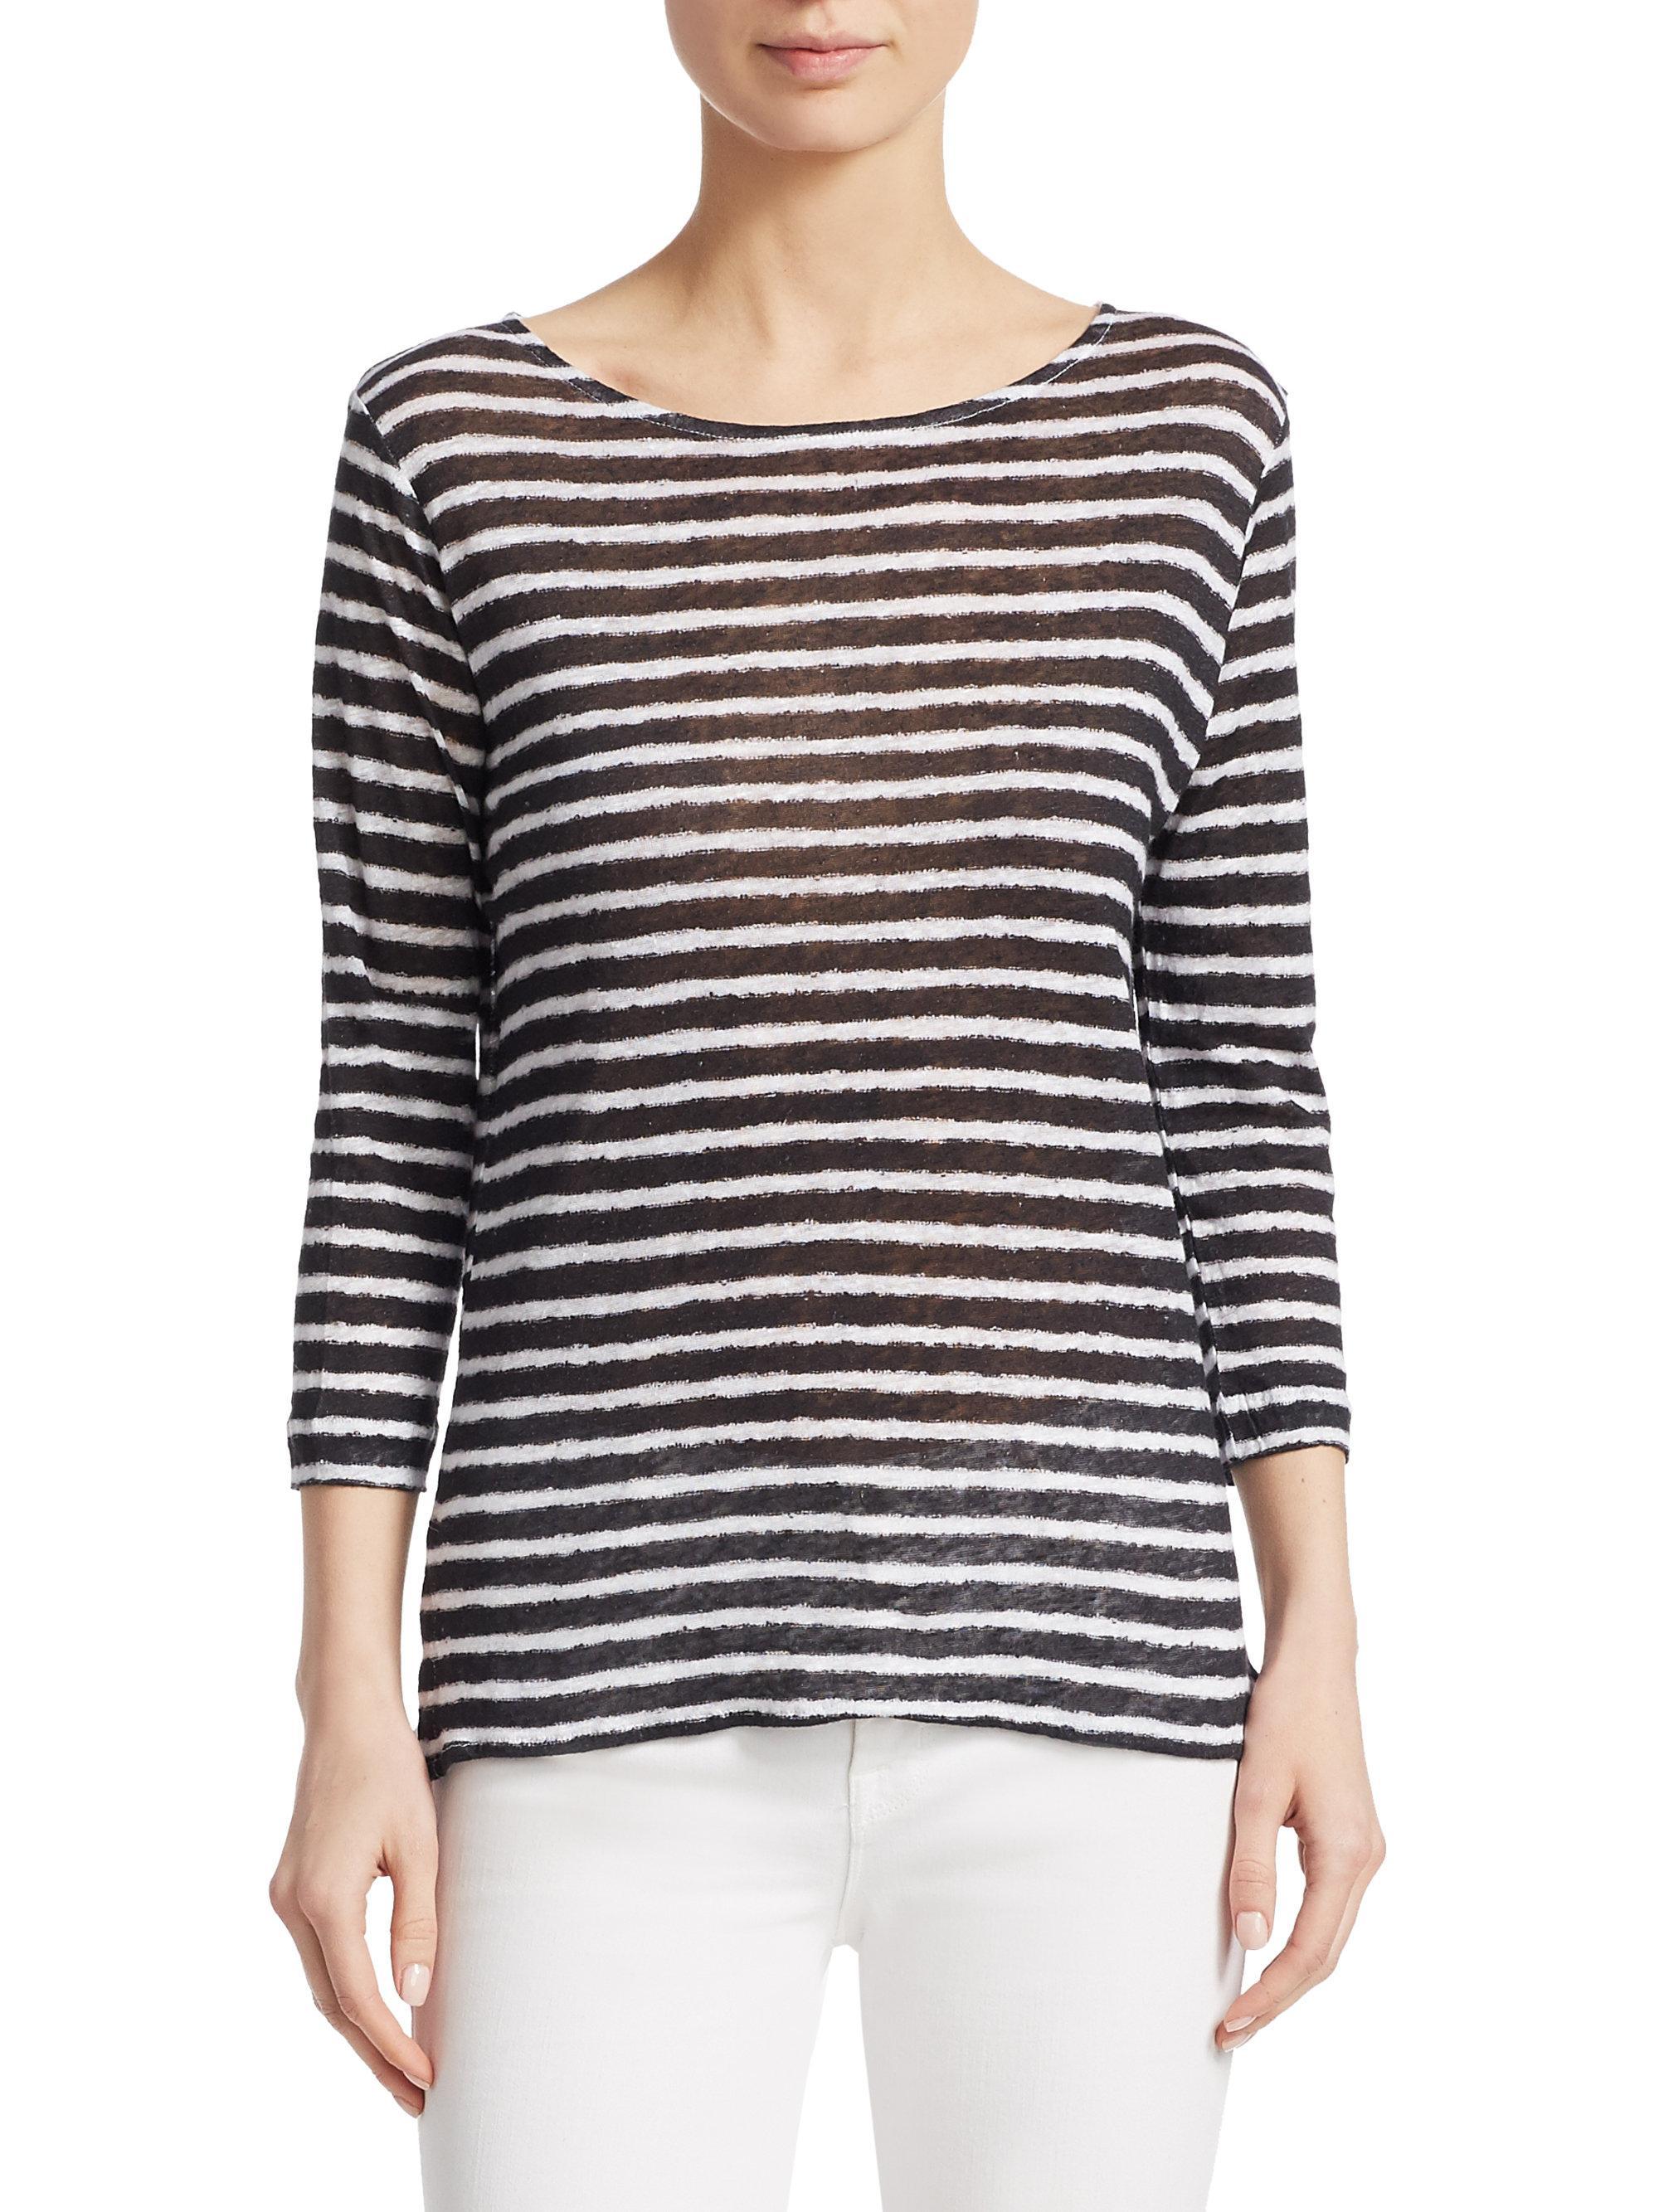 b28a6f3ce9 Lyst - Majestic Filatures Striped Linen Pullover in Black